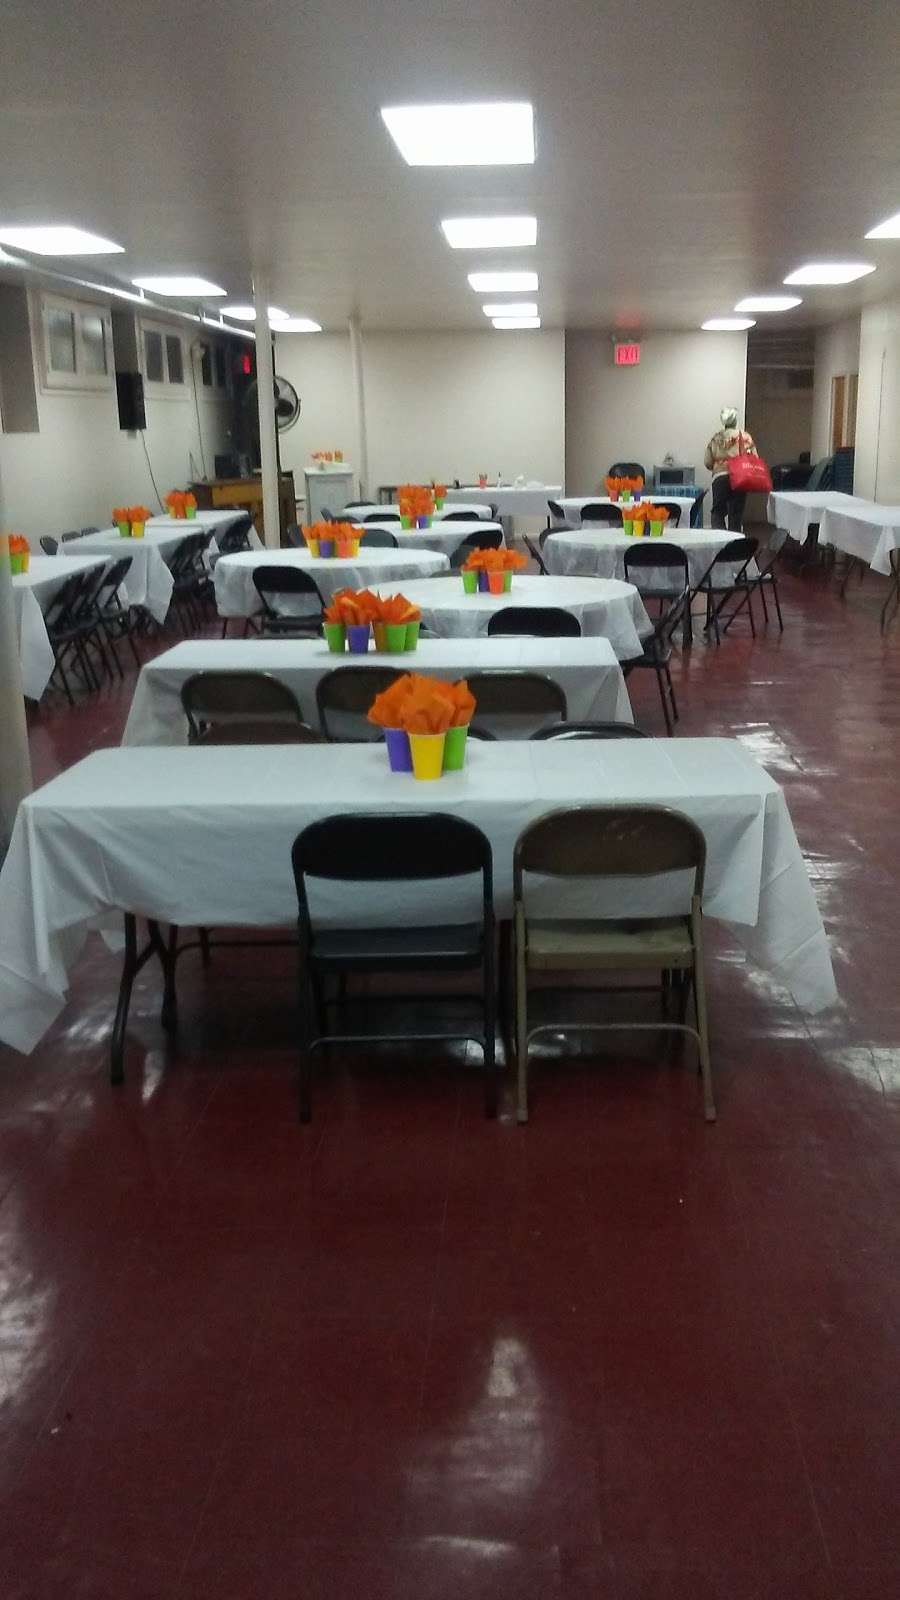 First Calvary Baptist Church - church    Photo 1 of 6   Address: 953 Putnam Ave, Brooklyn, NY 11221, USA   Phone: (718) 453-1278